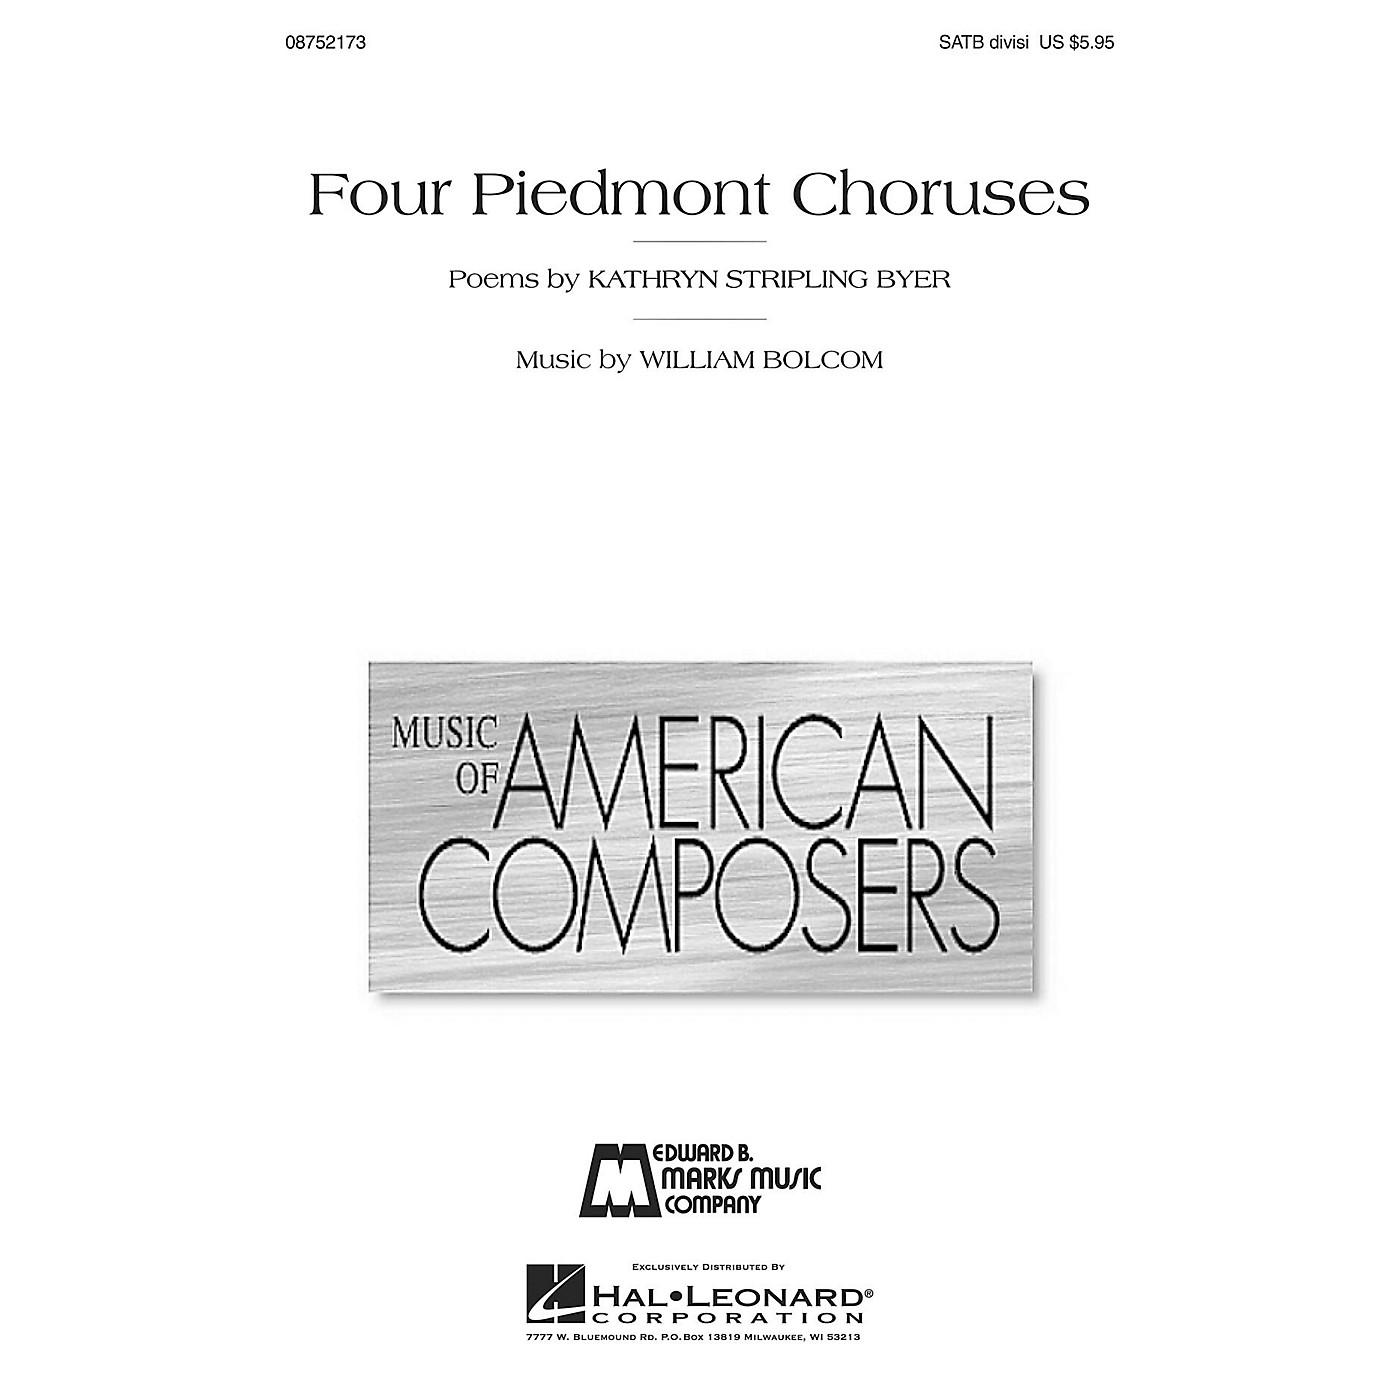 Hal Leonard Four Piedmont Choruses SATB Divisi composed by William Bolcom thumbnail